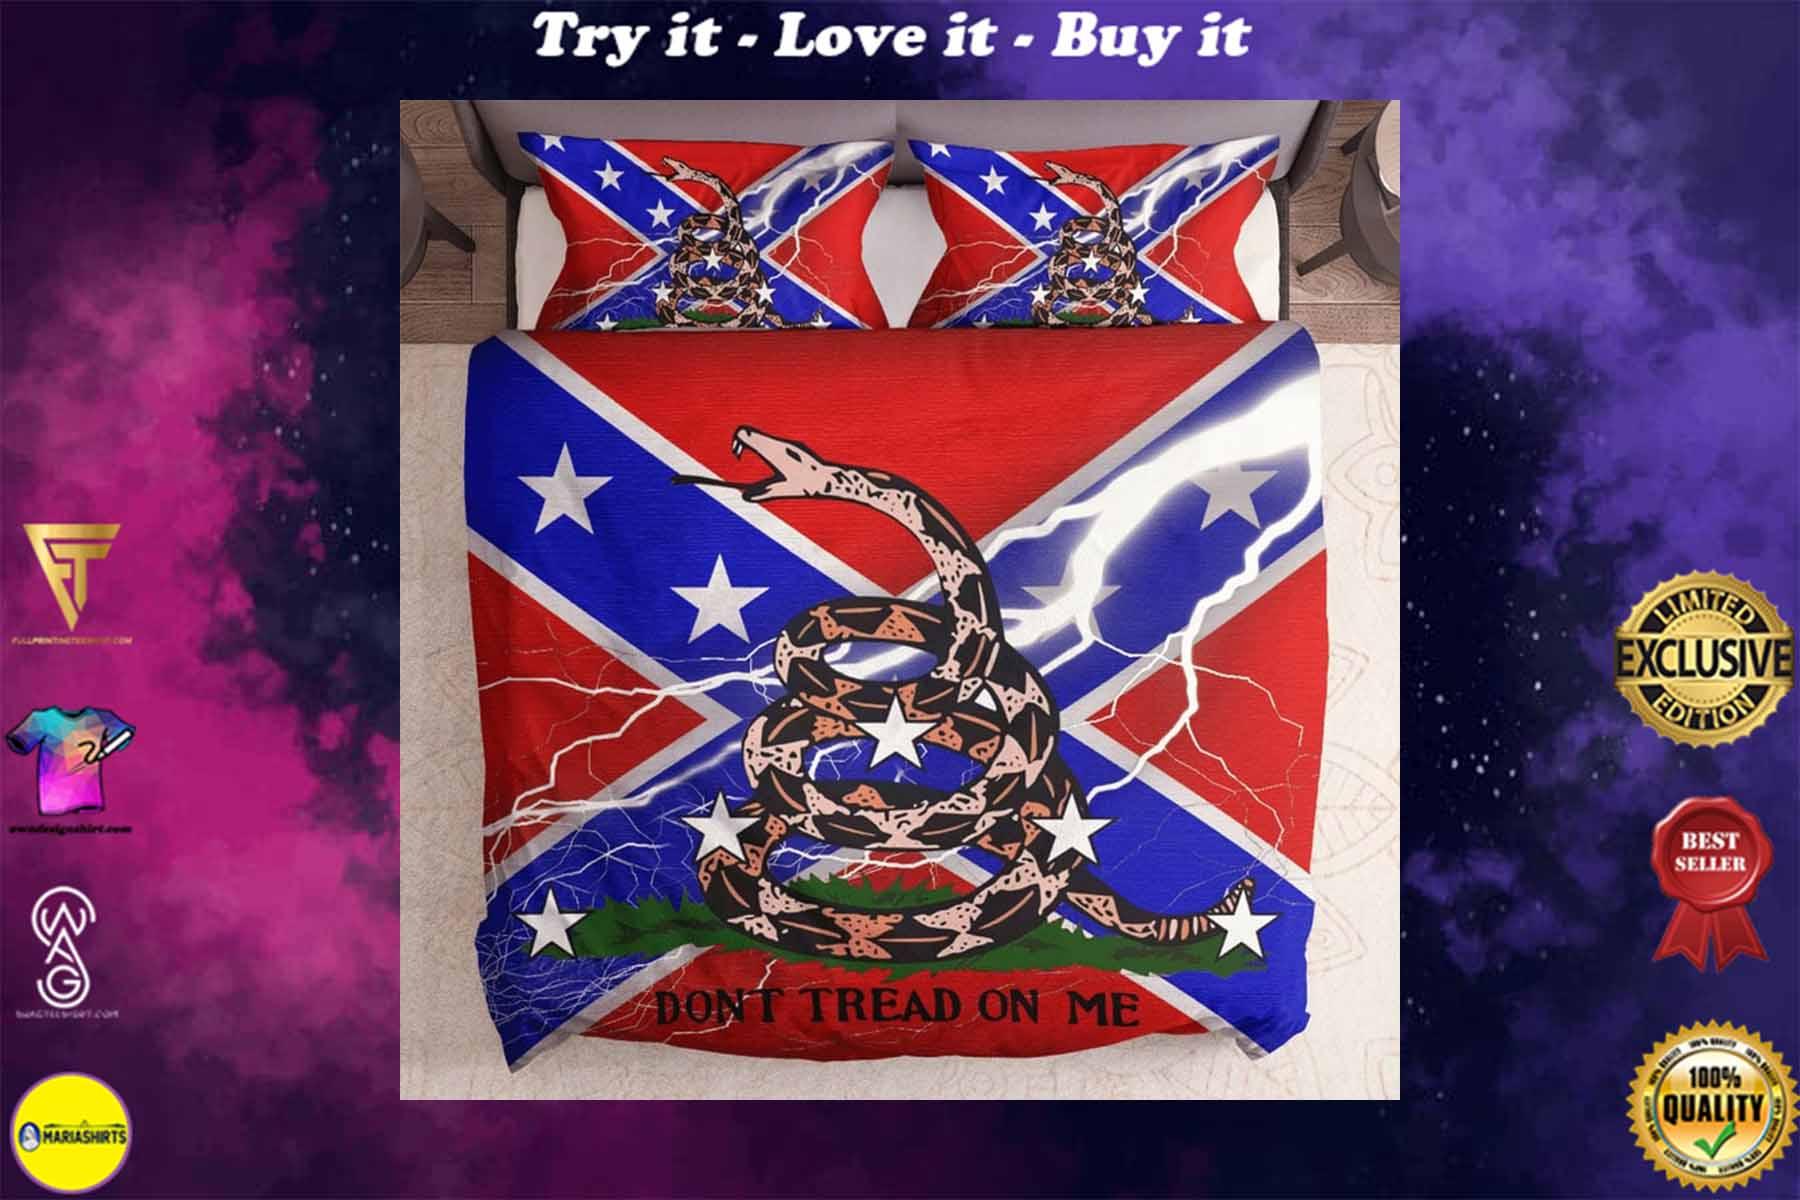 [special edition] the gadsden flag and confederate flag bedding set - maria